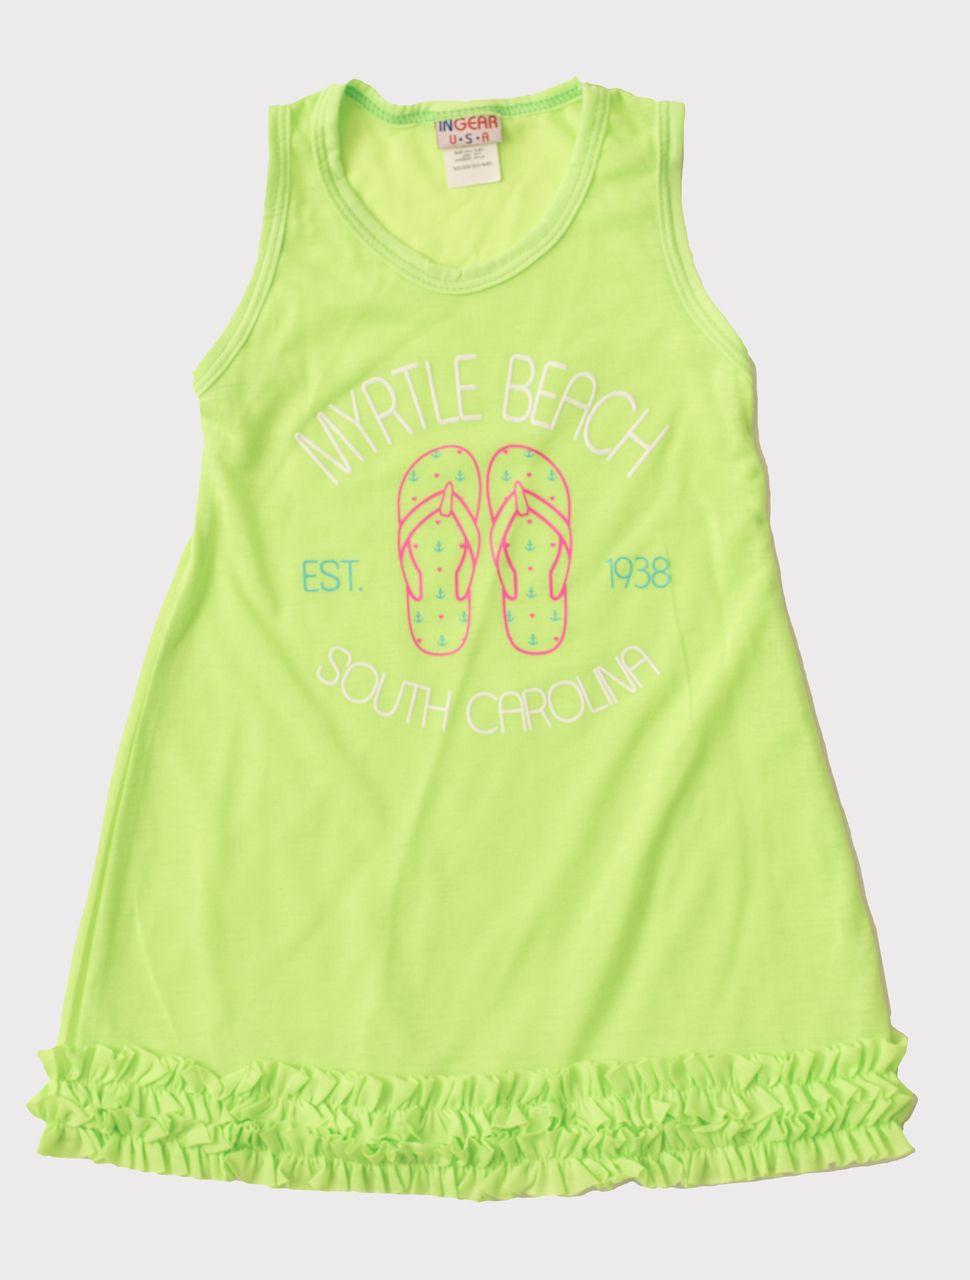 2b937644737 Little Ones · Baby Boy · Beach Playsuit · Eagles Beachwear - Girls MB Flip  Flop Ruffle Dress